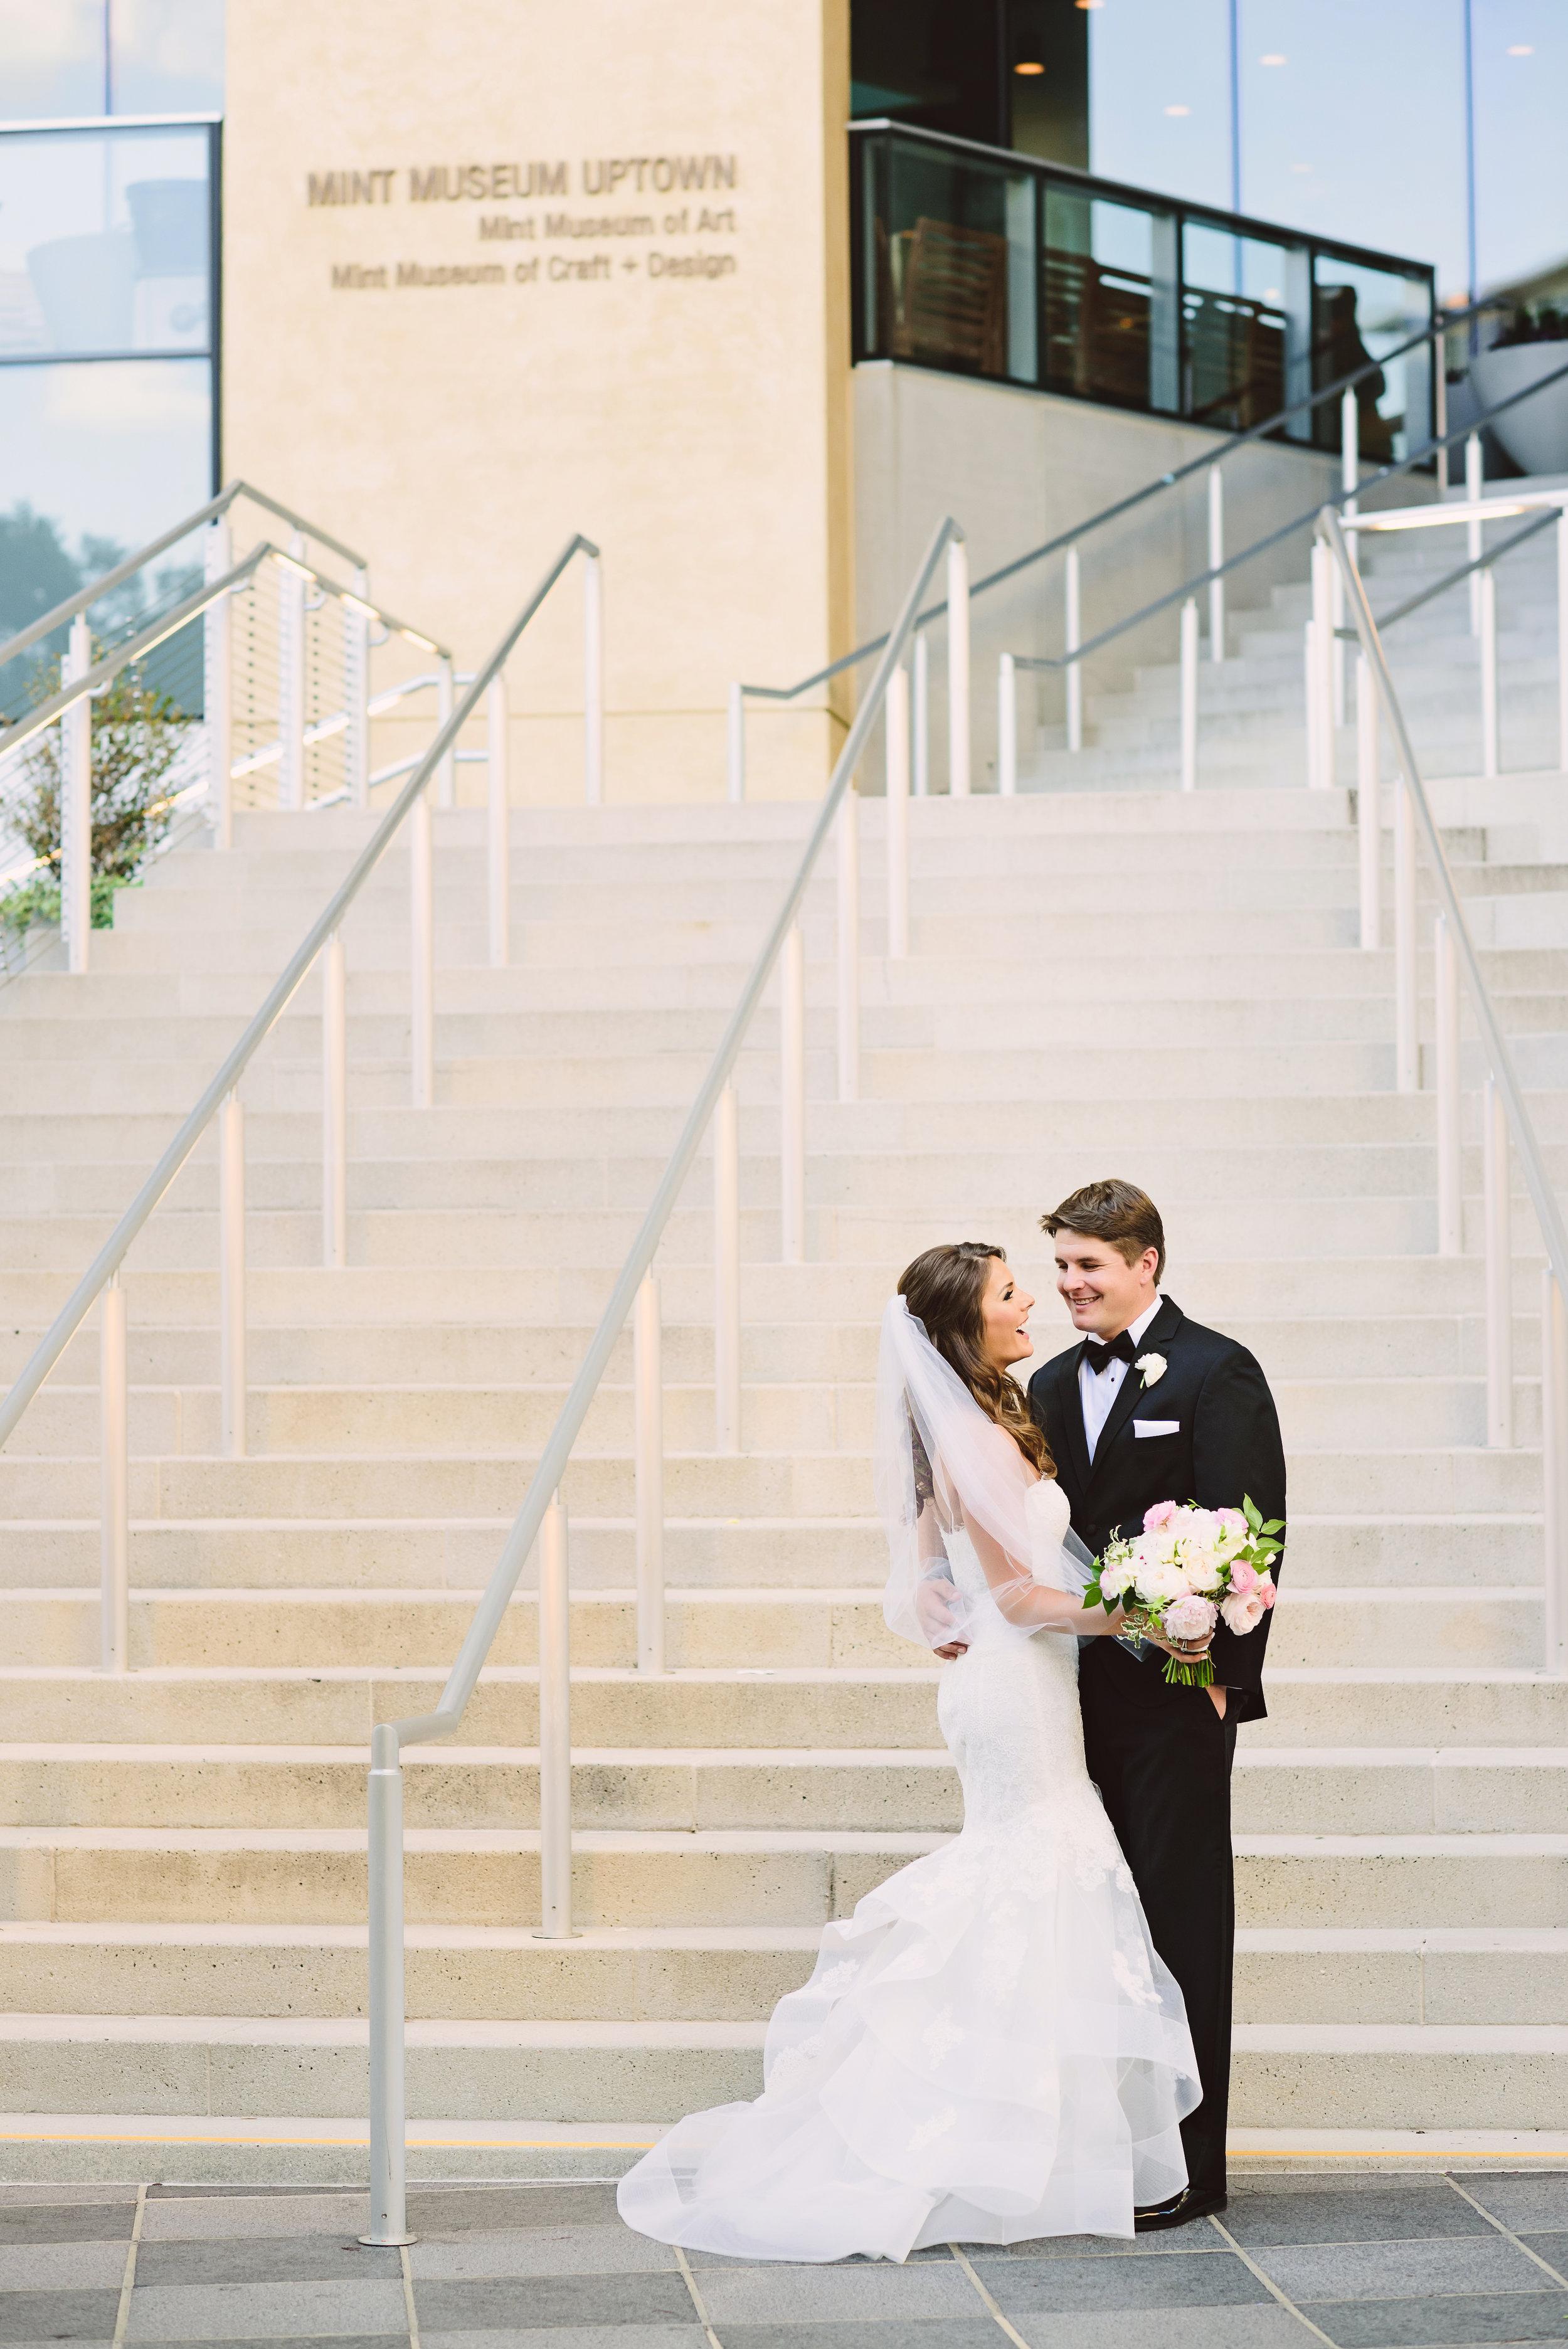 Monique Lhuillier wedding dress, Black tie wedding, Lace wedding dress, Wedding hair style, Veil, Uptown Charlotte Wedding venue, Mint Museum Uptown wedding in Charlotte, North Carolina by The Graceful Host